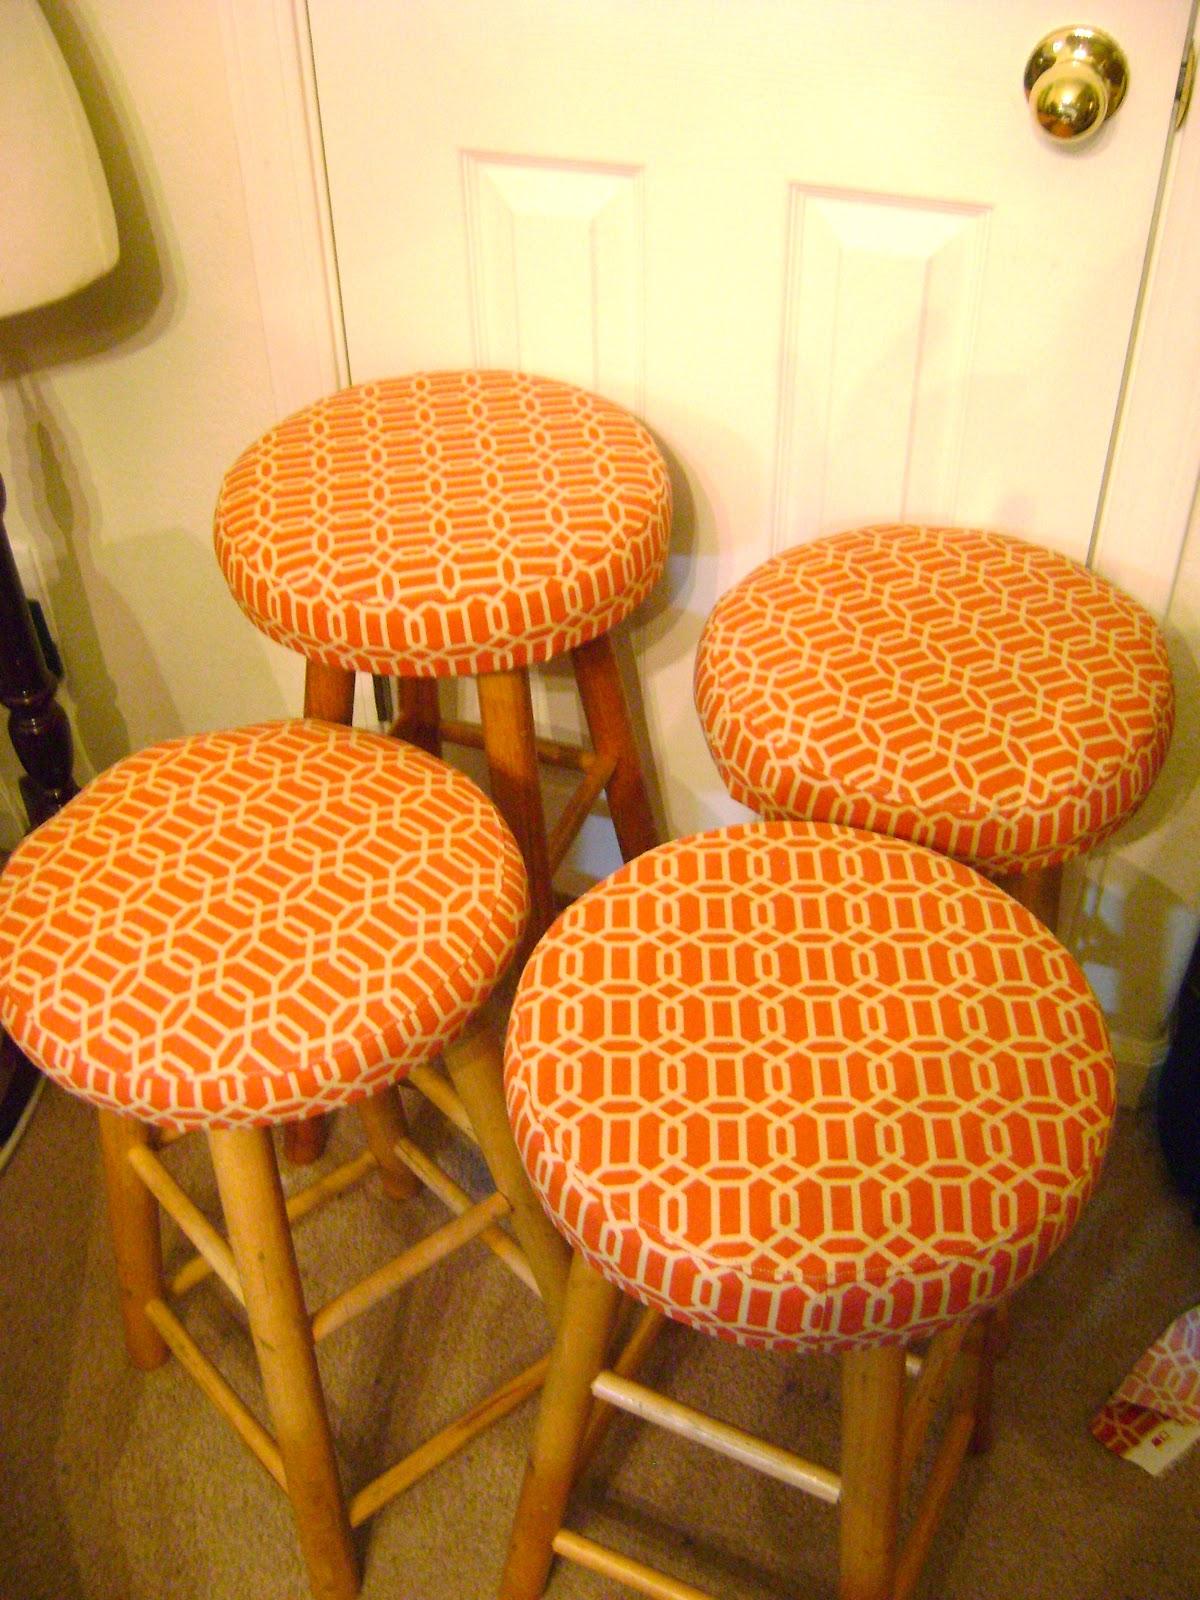 Goosegirl sews Reupholstered Bar Stools With Tutorial : DSC04897 from goosegirlsews.blogspot.ca size 1200 x 1600 jpeg 365kB